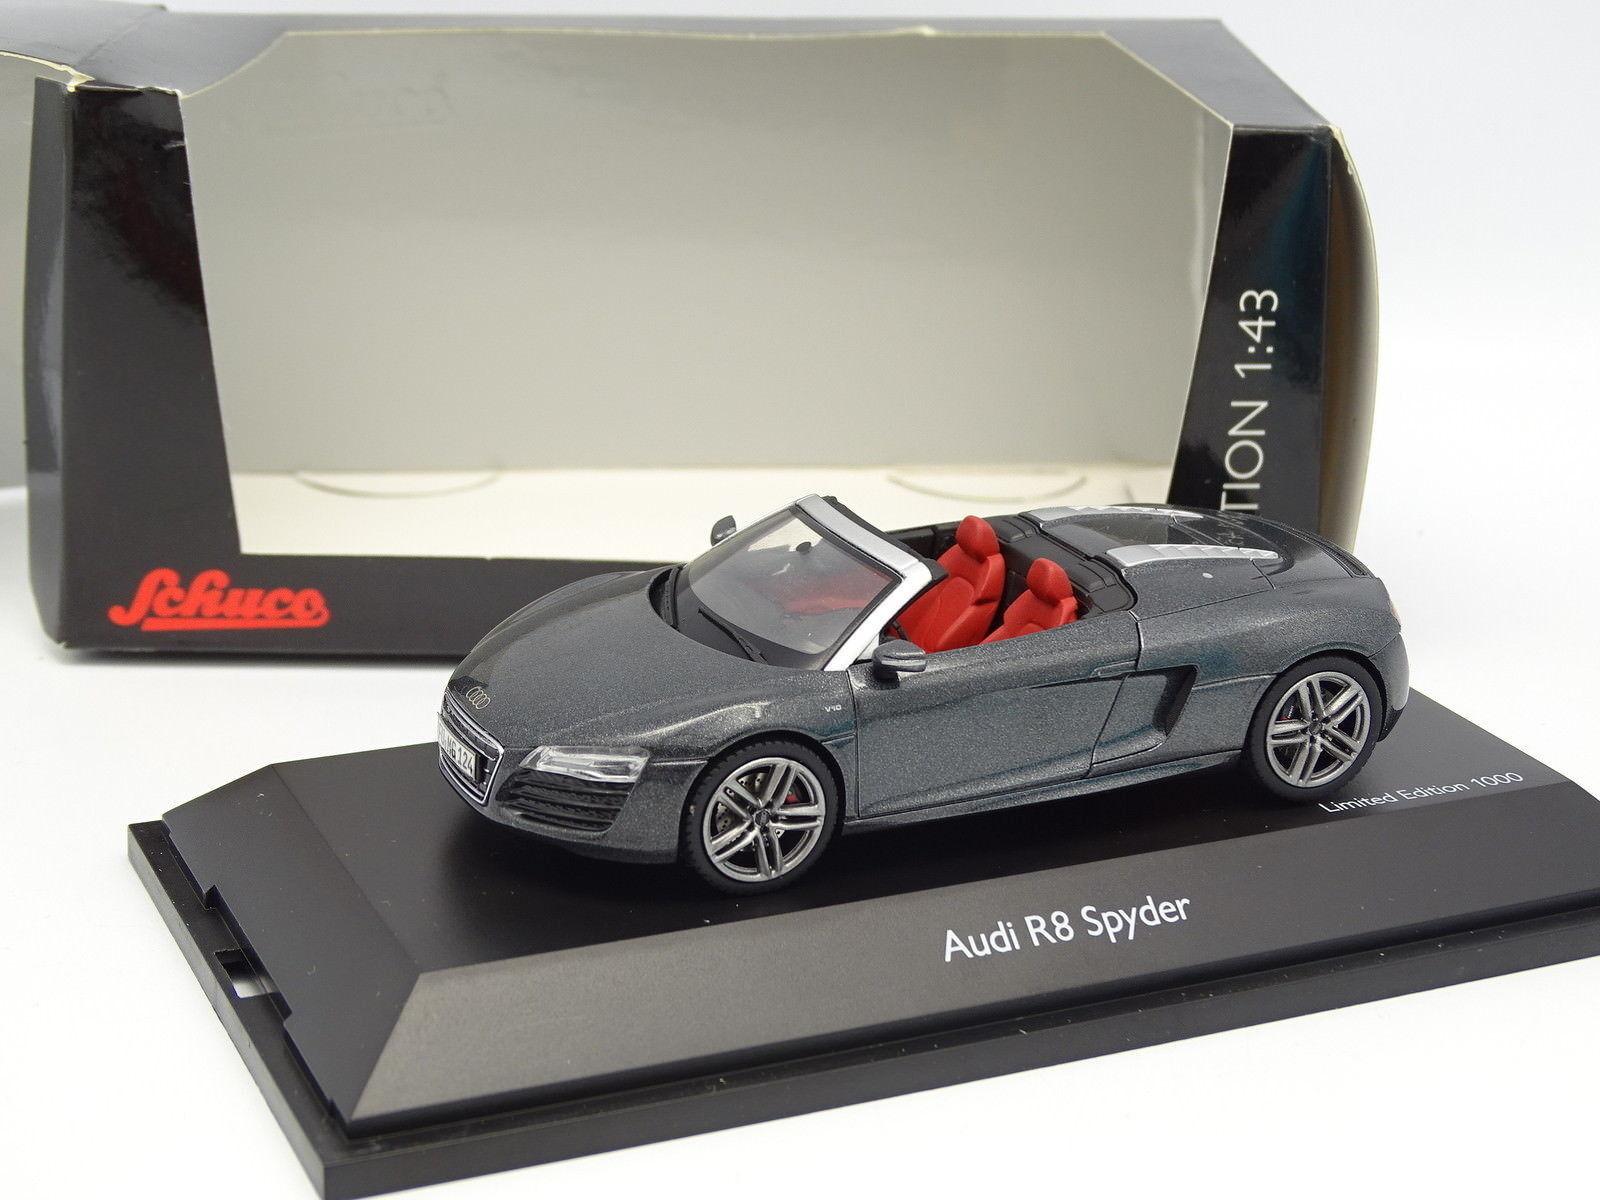 Schuco 1 43 - Audi R8 Spyder Antracita 2011